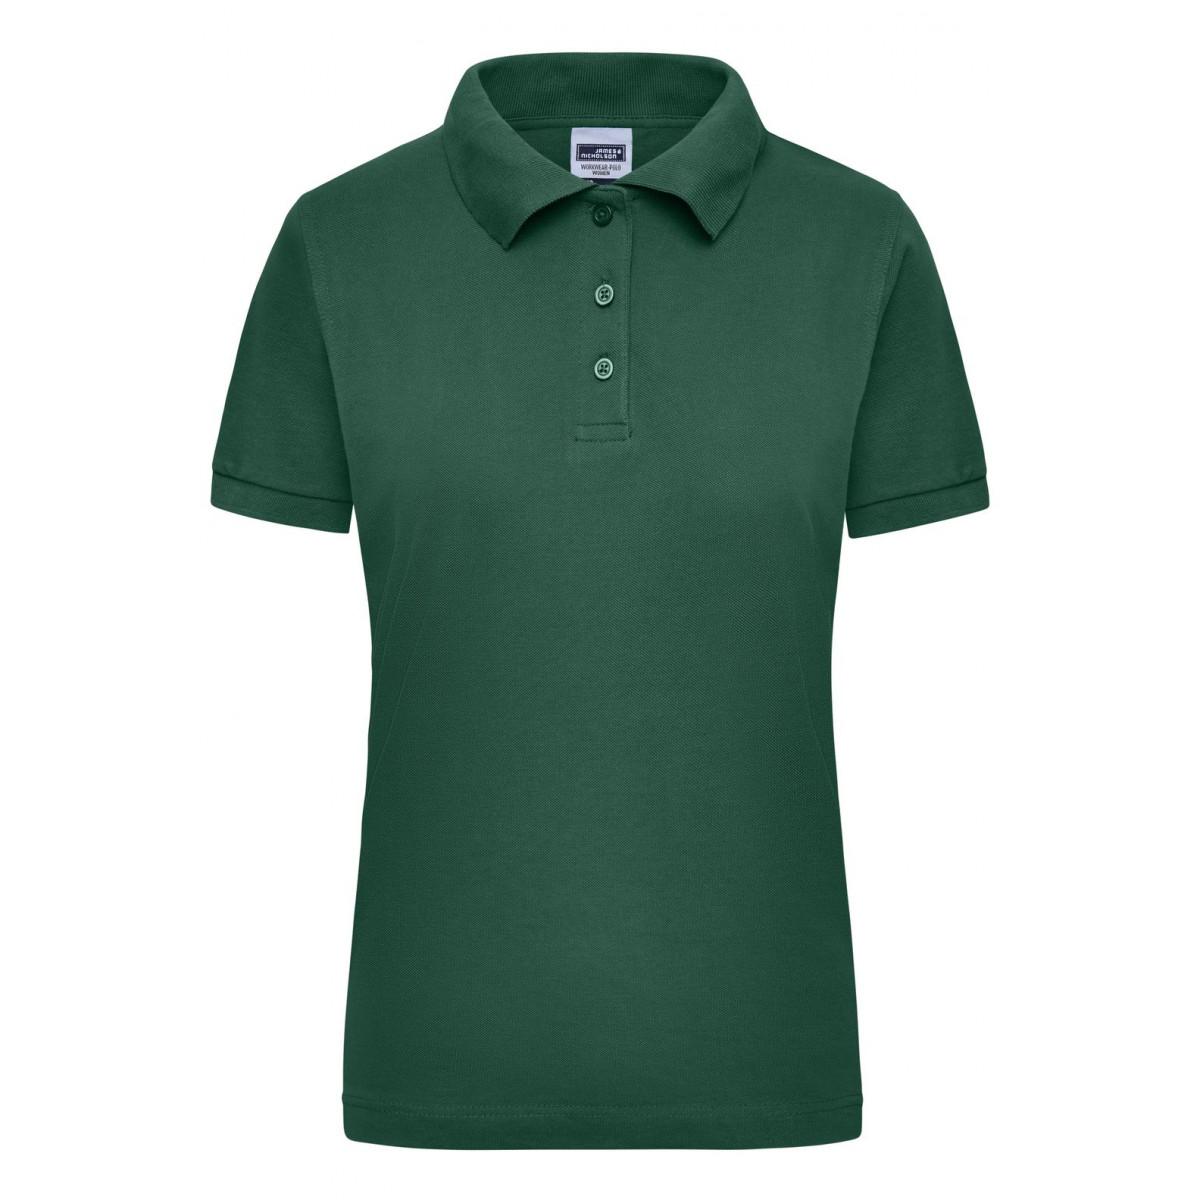 Рубашка поло мужская JN803 Workwear Polo Women - Темно-зеленый